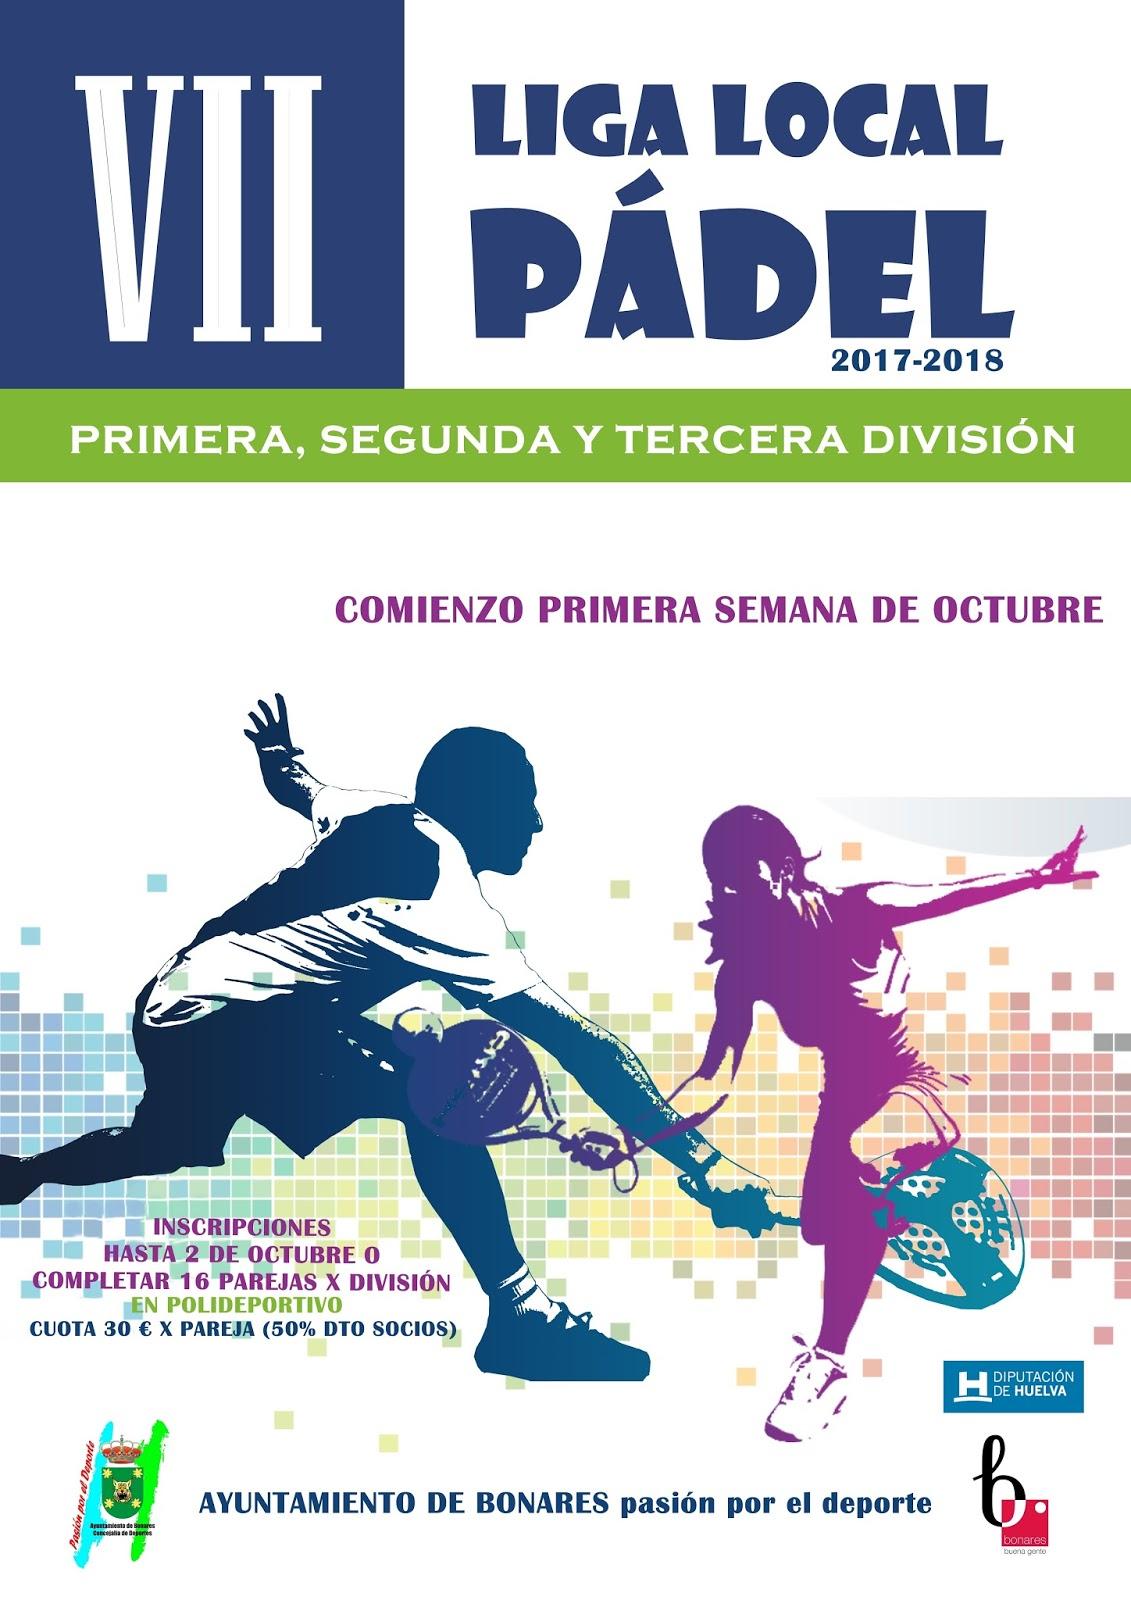 VII LIGA LOCAL DE PÁDEL